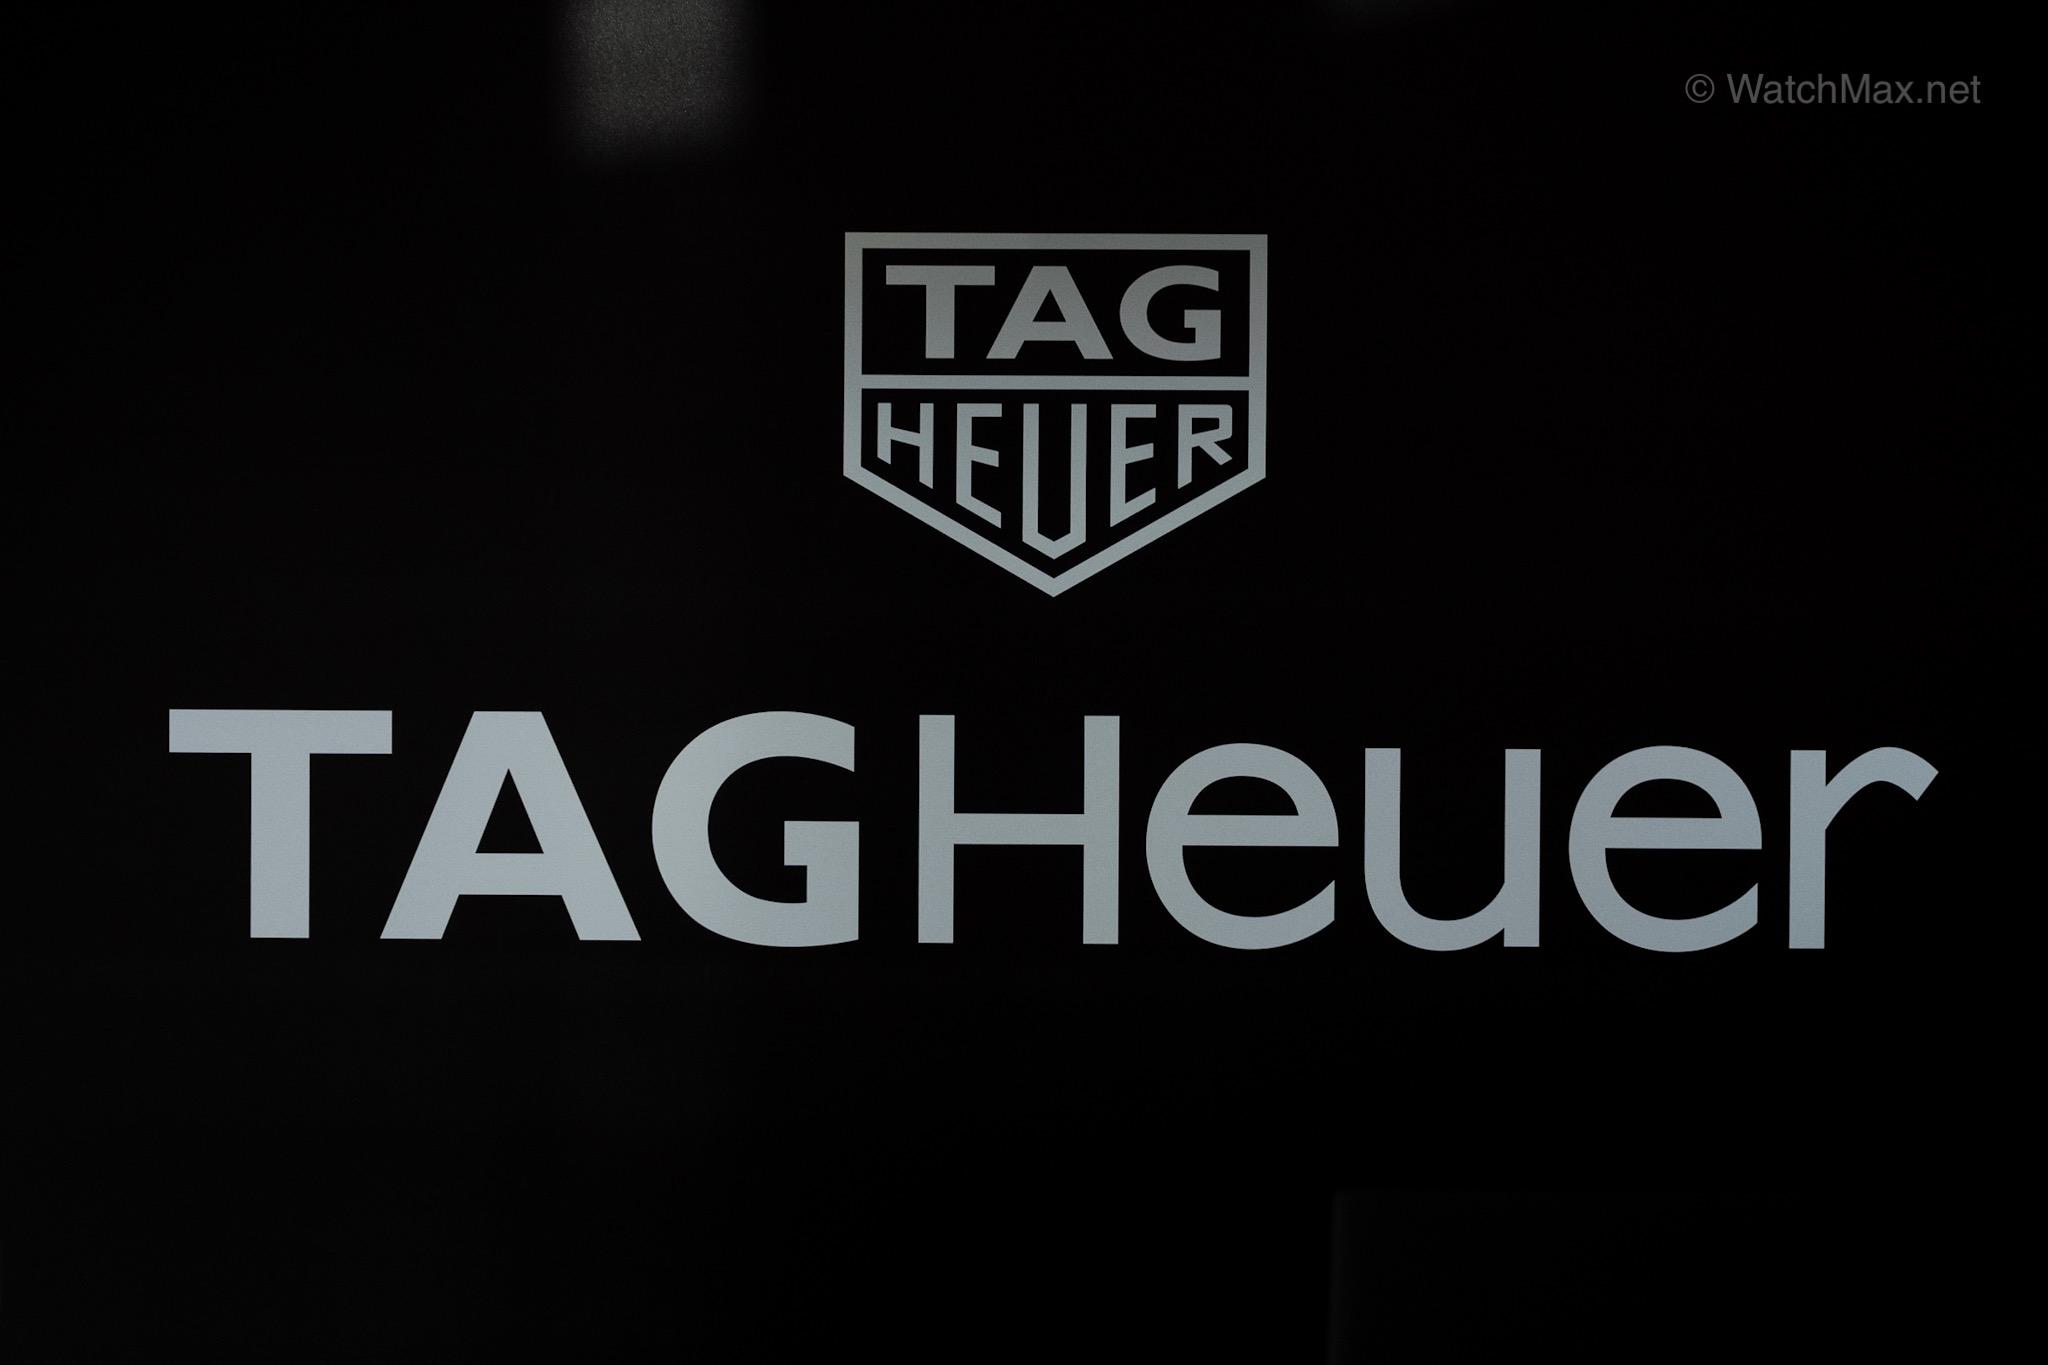 tag-heuer-tourbillon-nanograph-geneva-days-2019-3.jpg